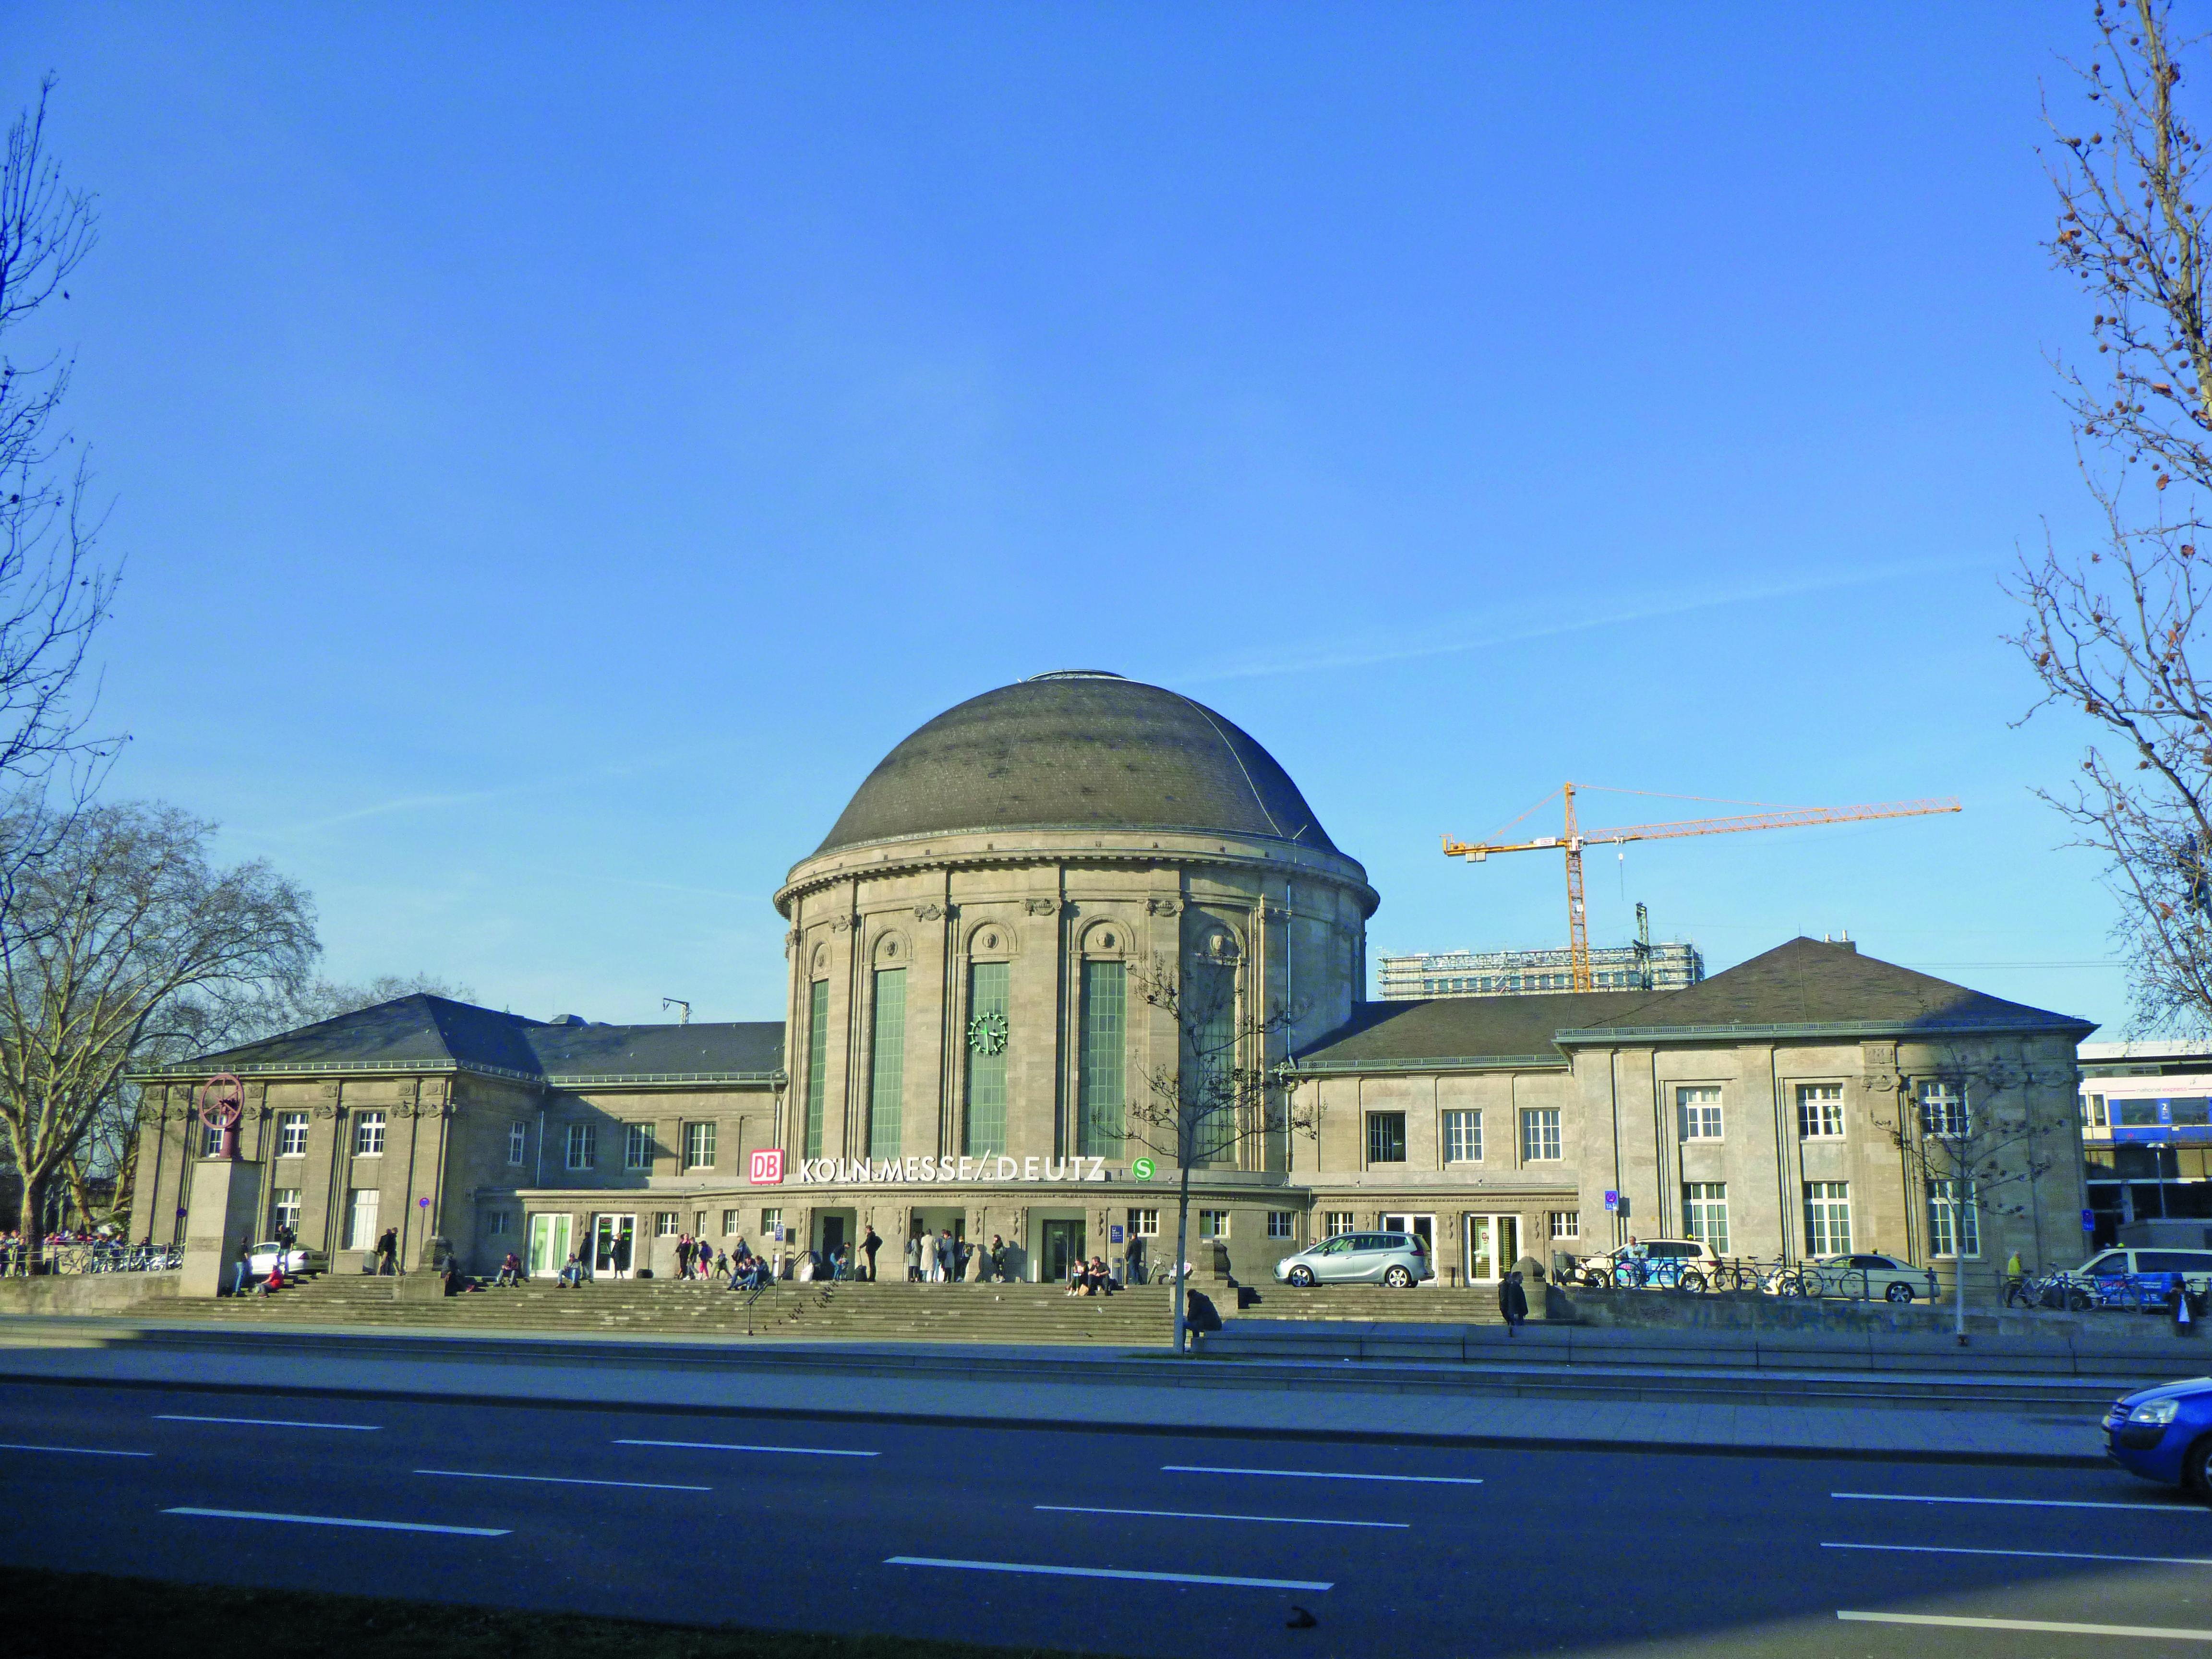 Deutz Bahnhof, Rheingold Immobilien